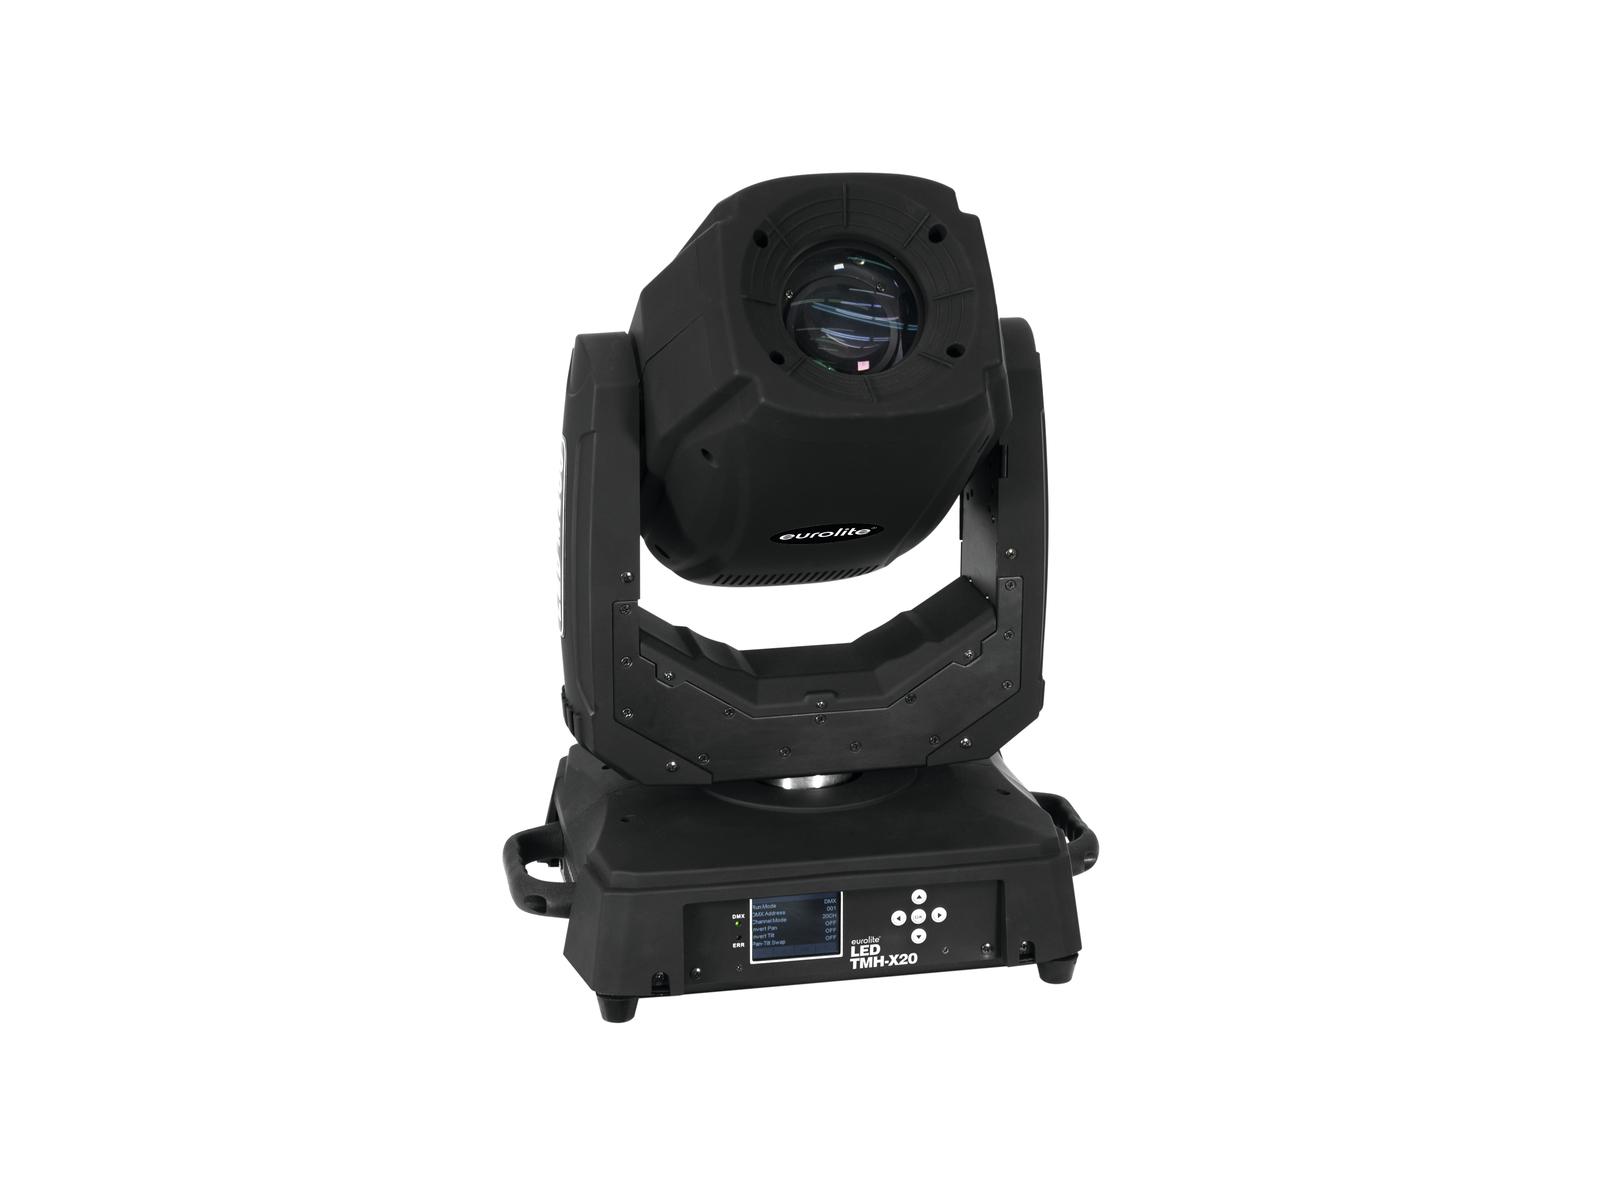 EUROLITE LED TMH-X20 Testa mobile Spot